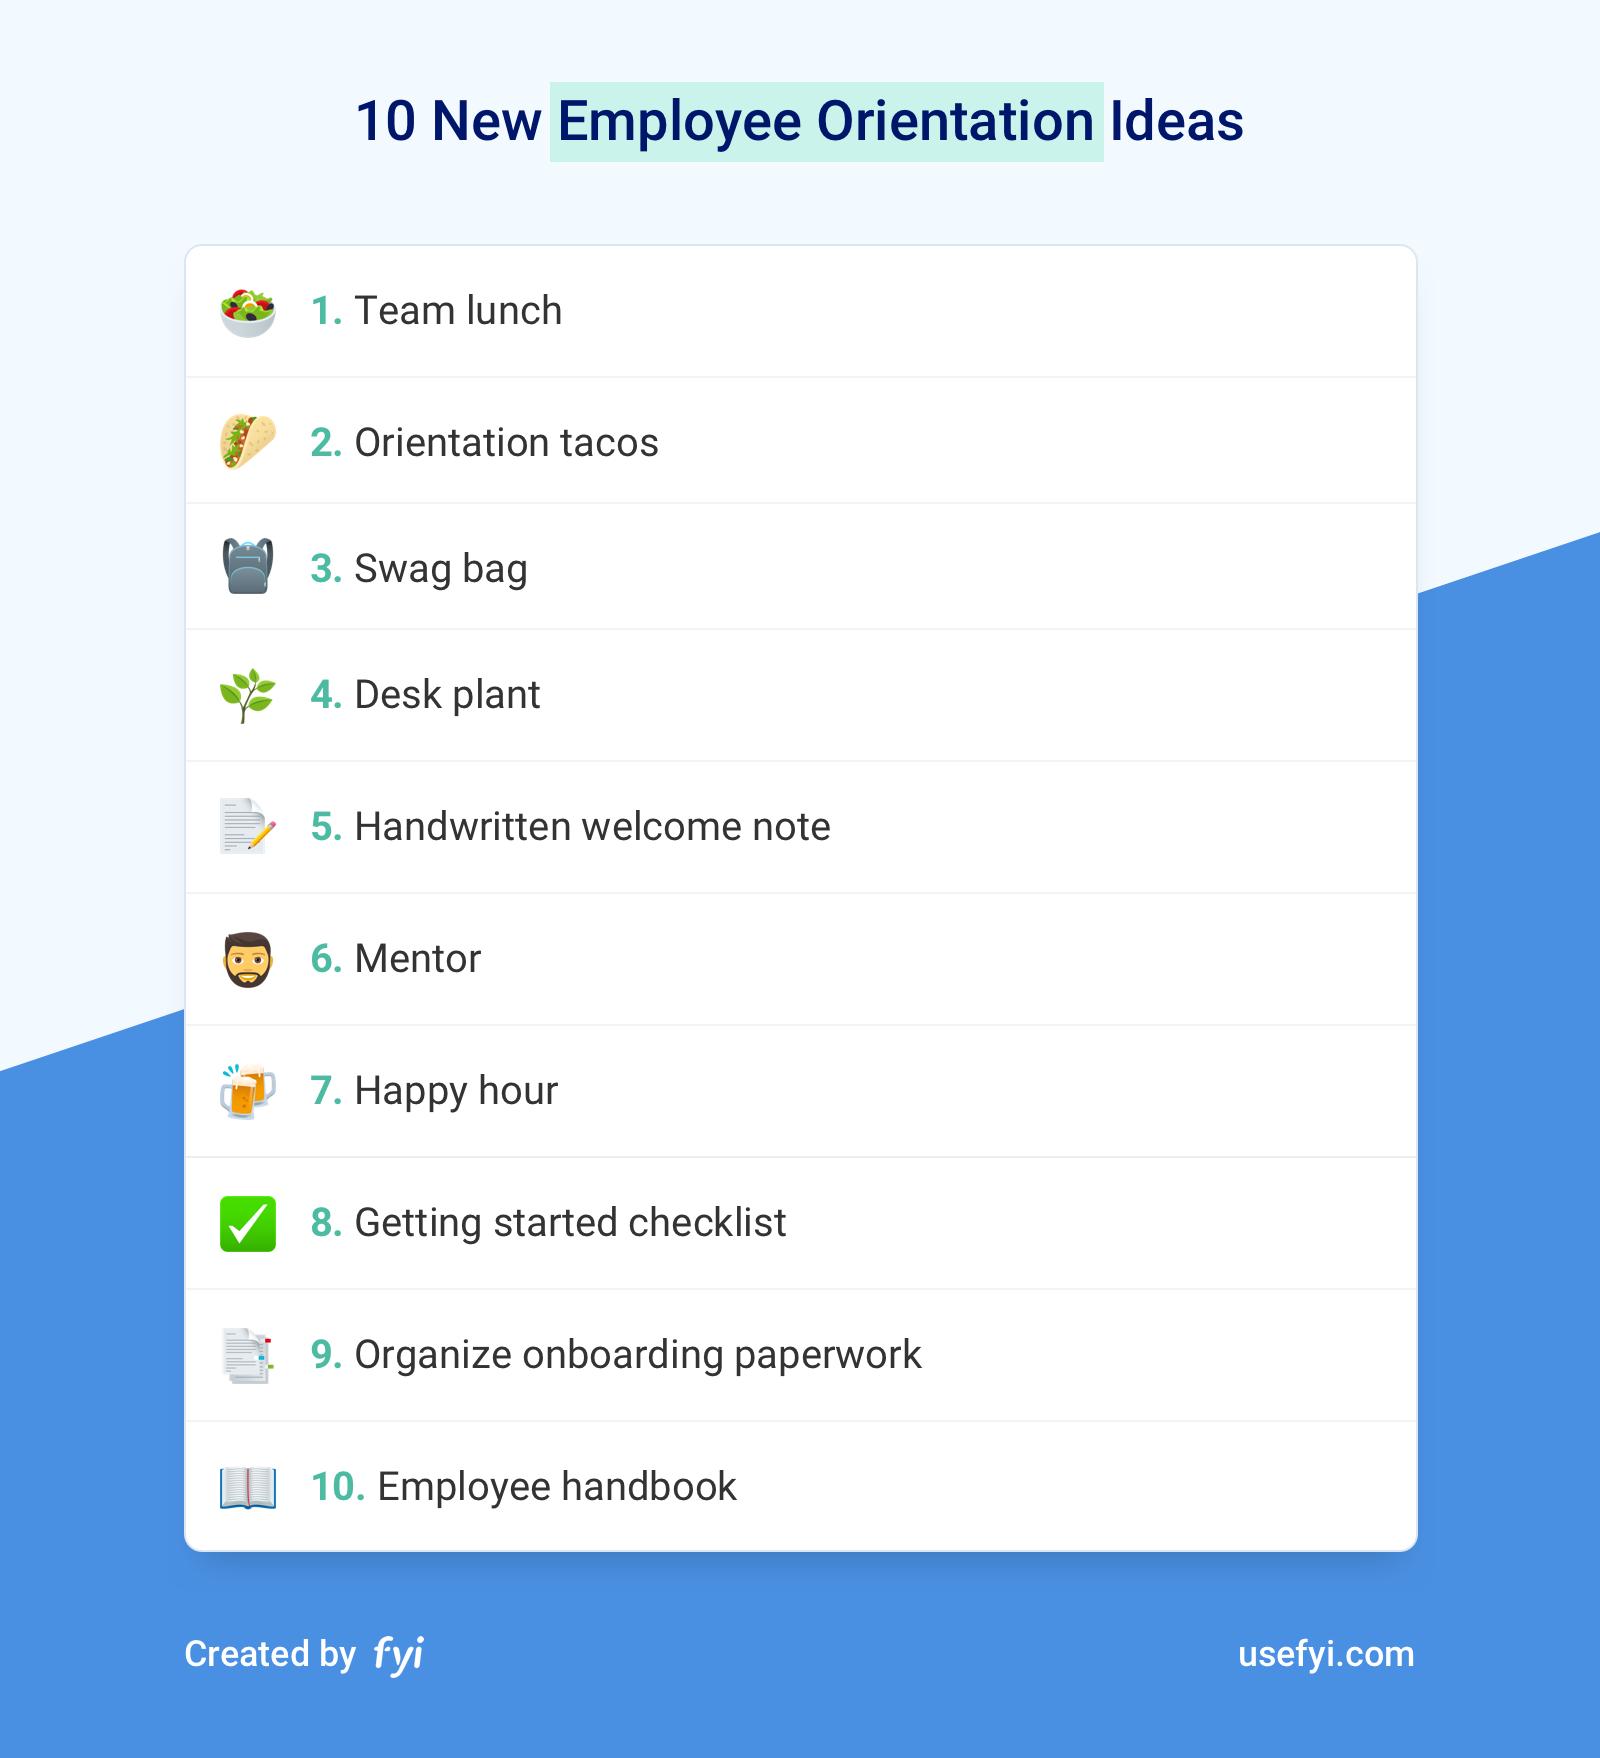 New Employee Orientation Ideas